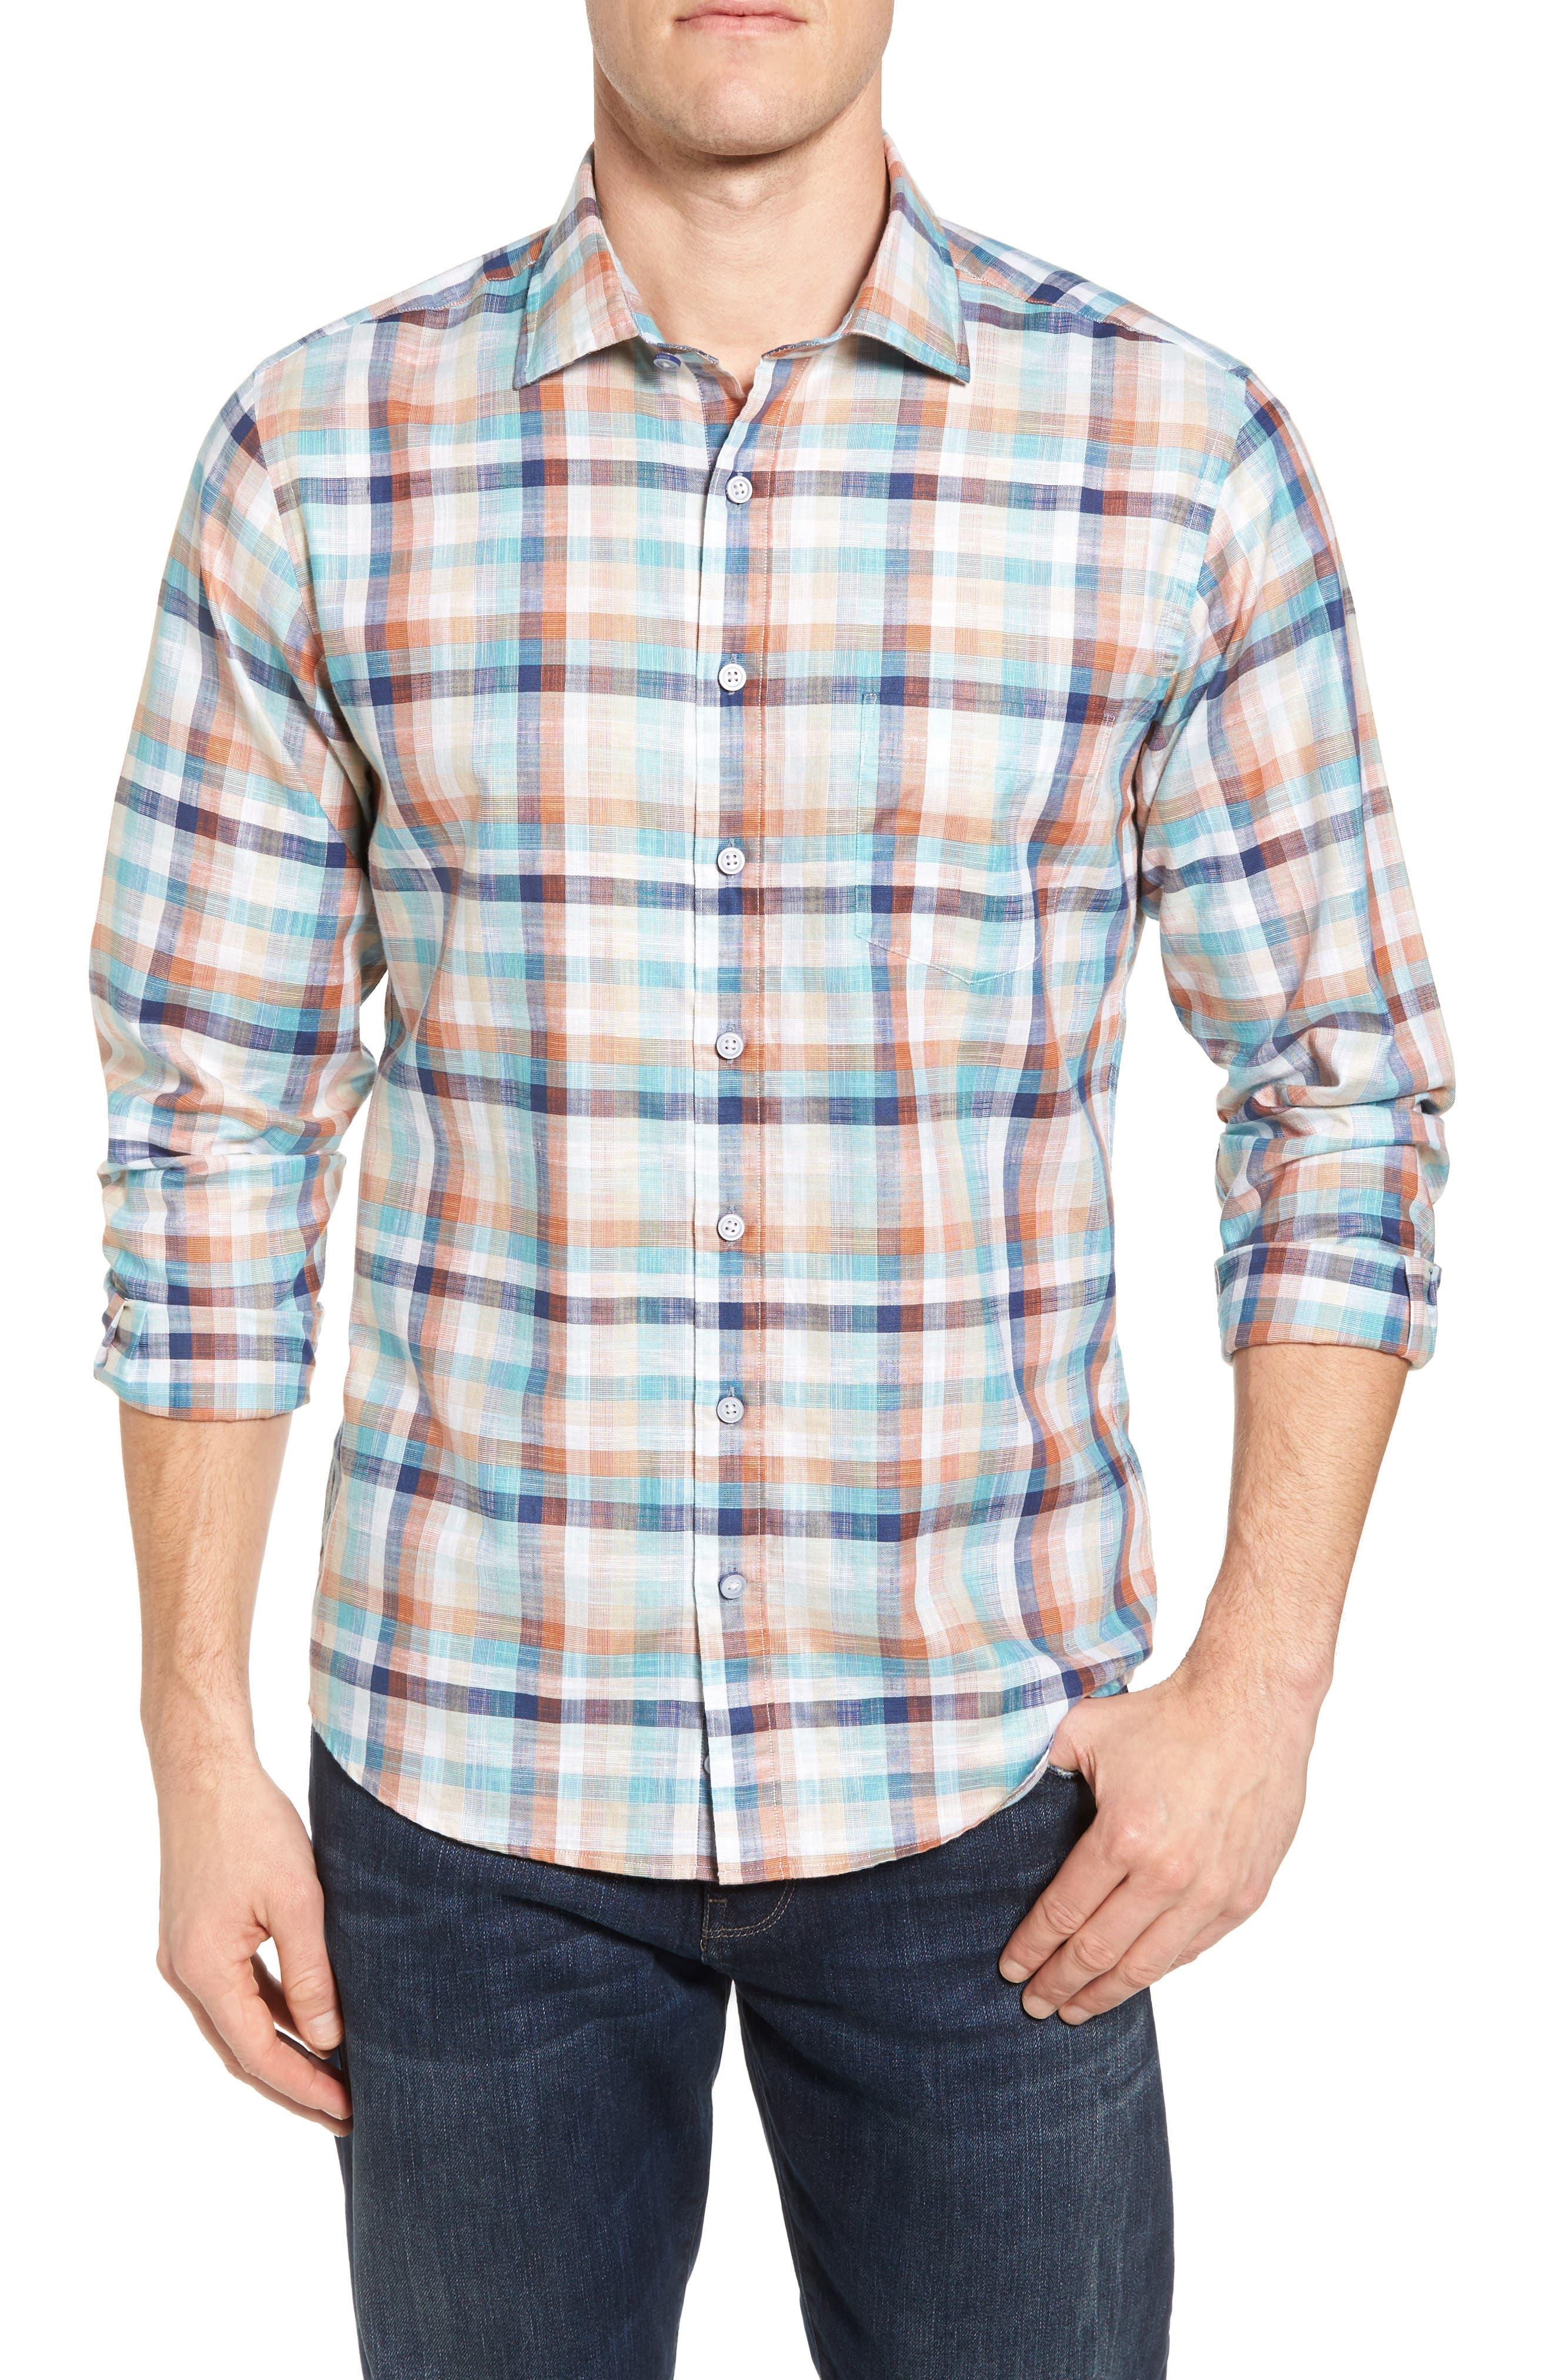 Blackburn Plaid Sport Shirt,                         Main,                         color, 200